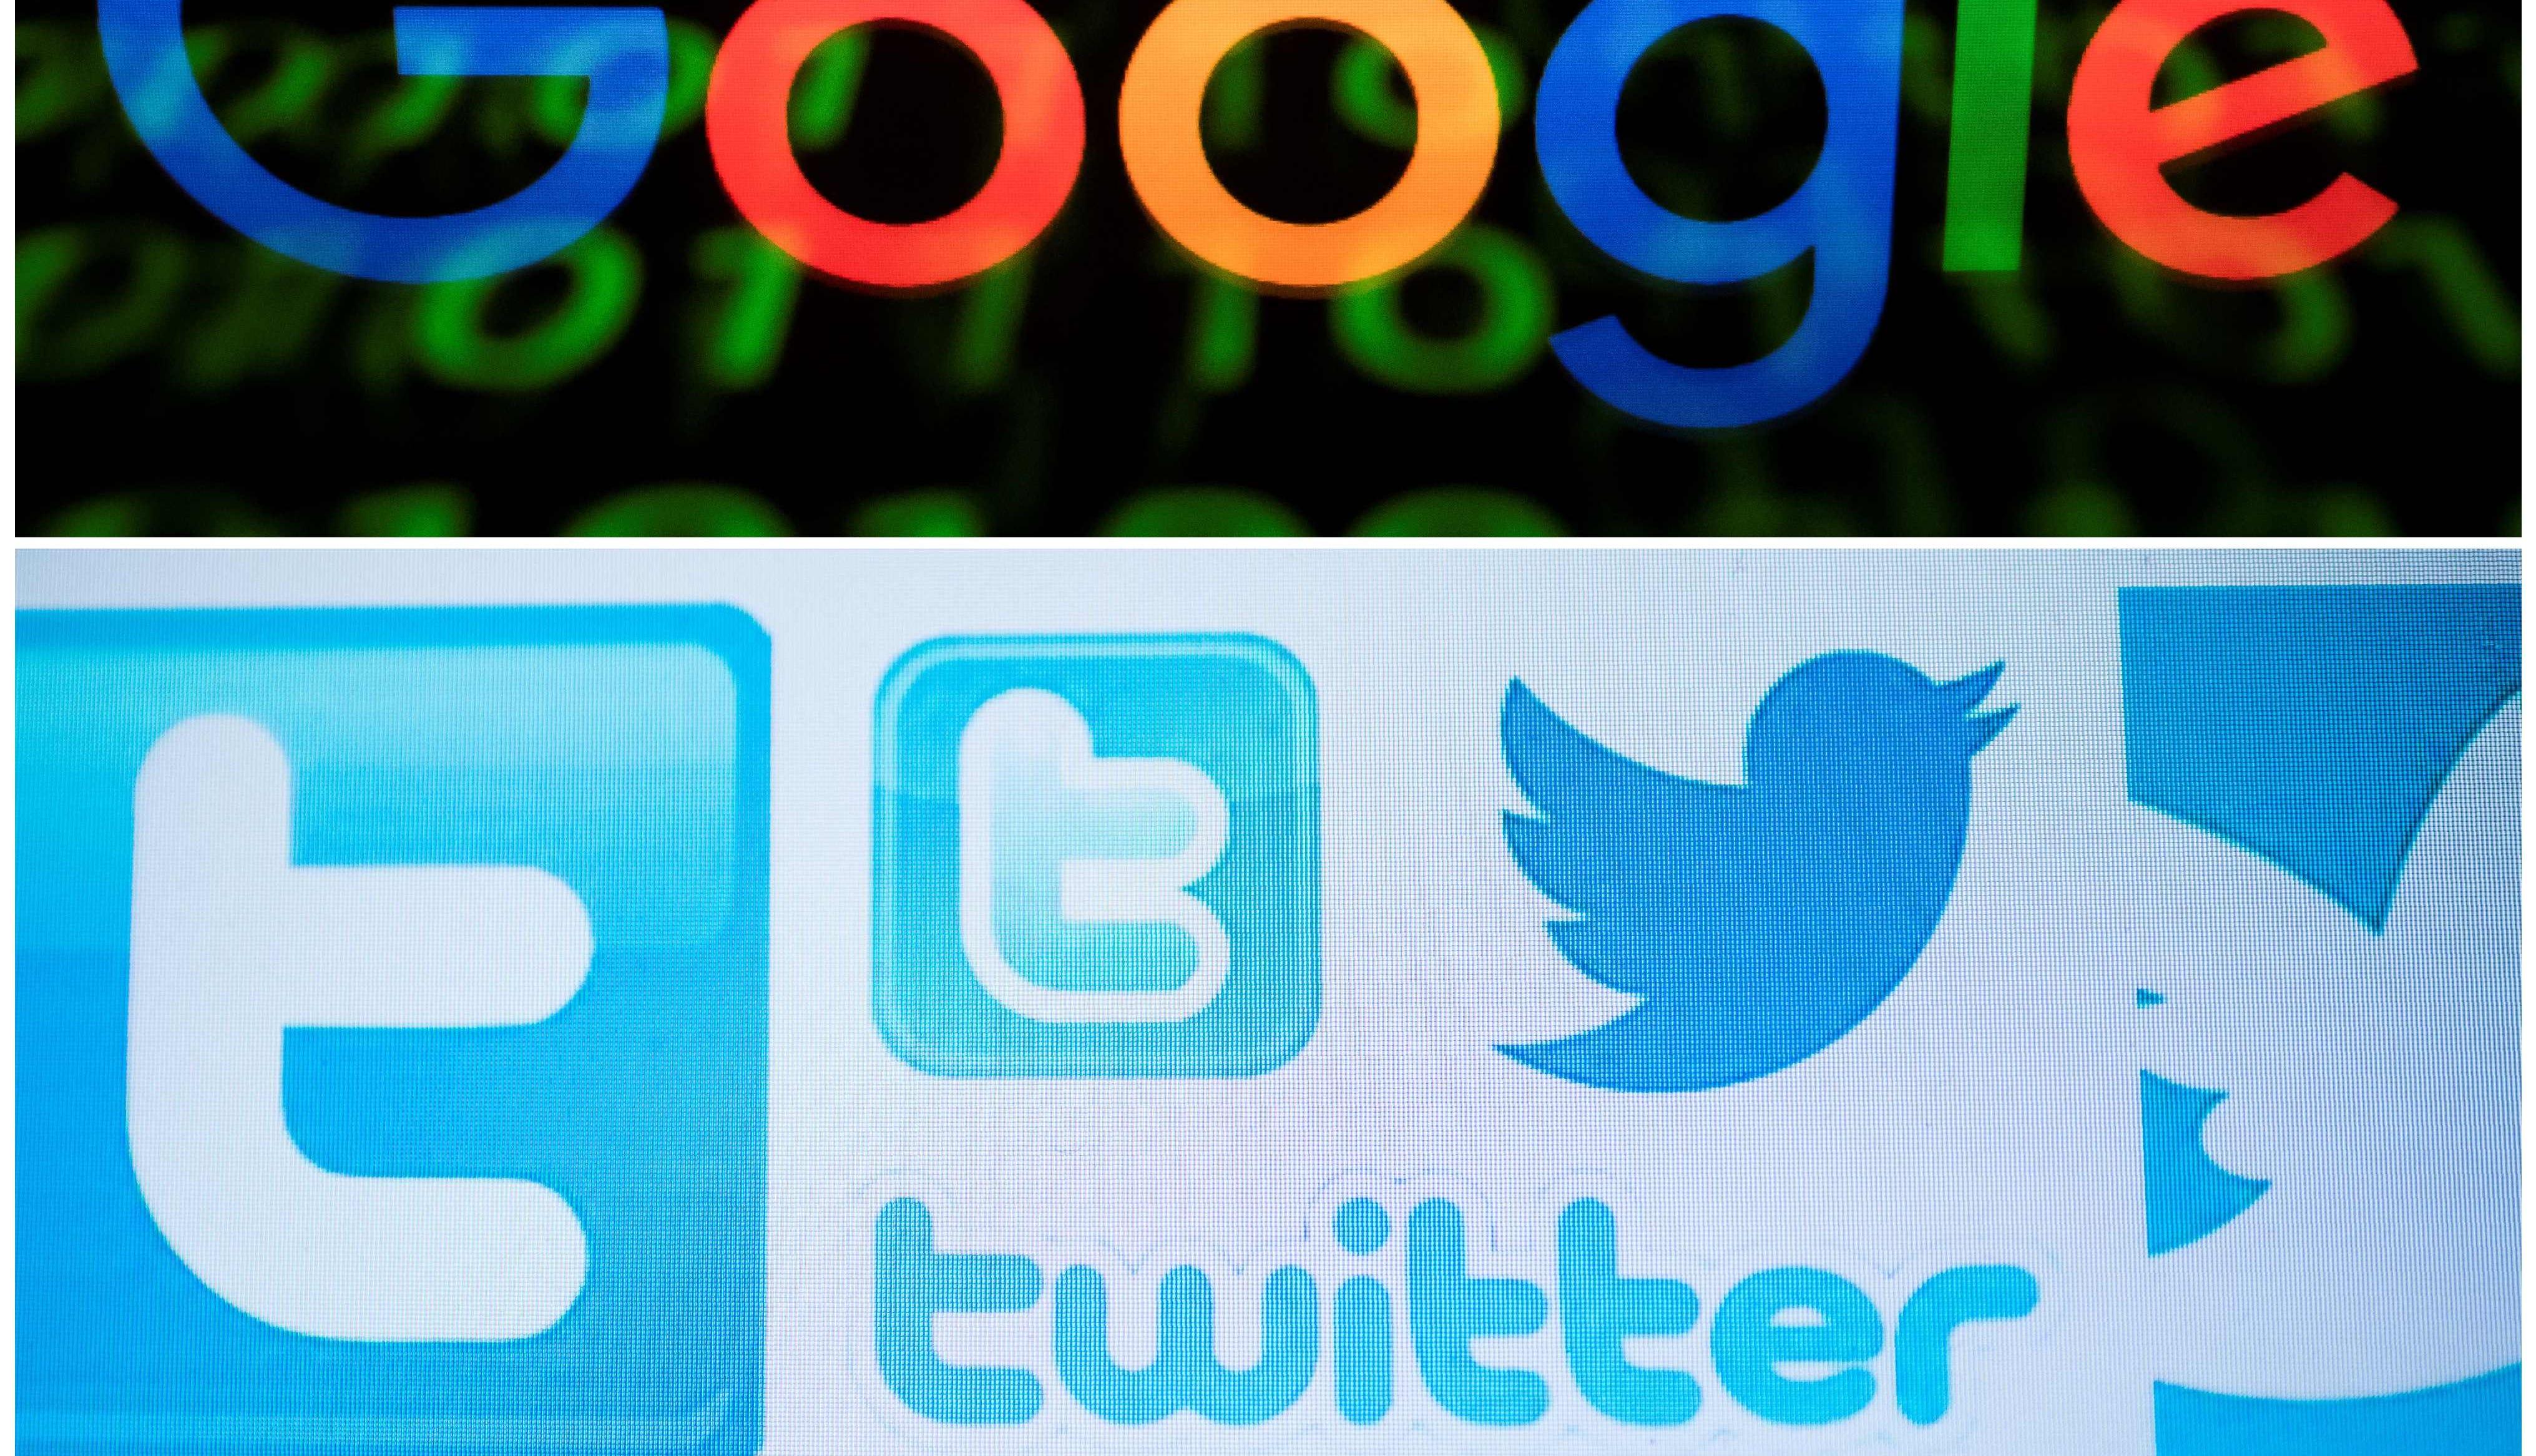 Google, Twitter and Facebook logos.